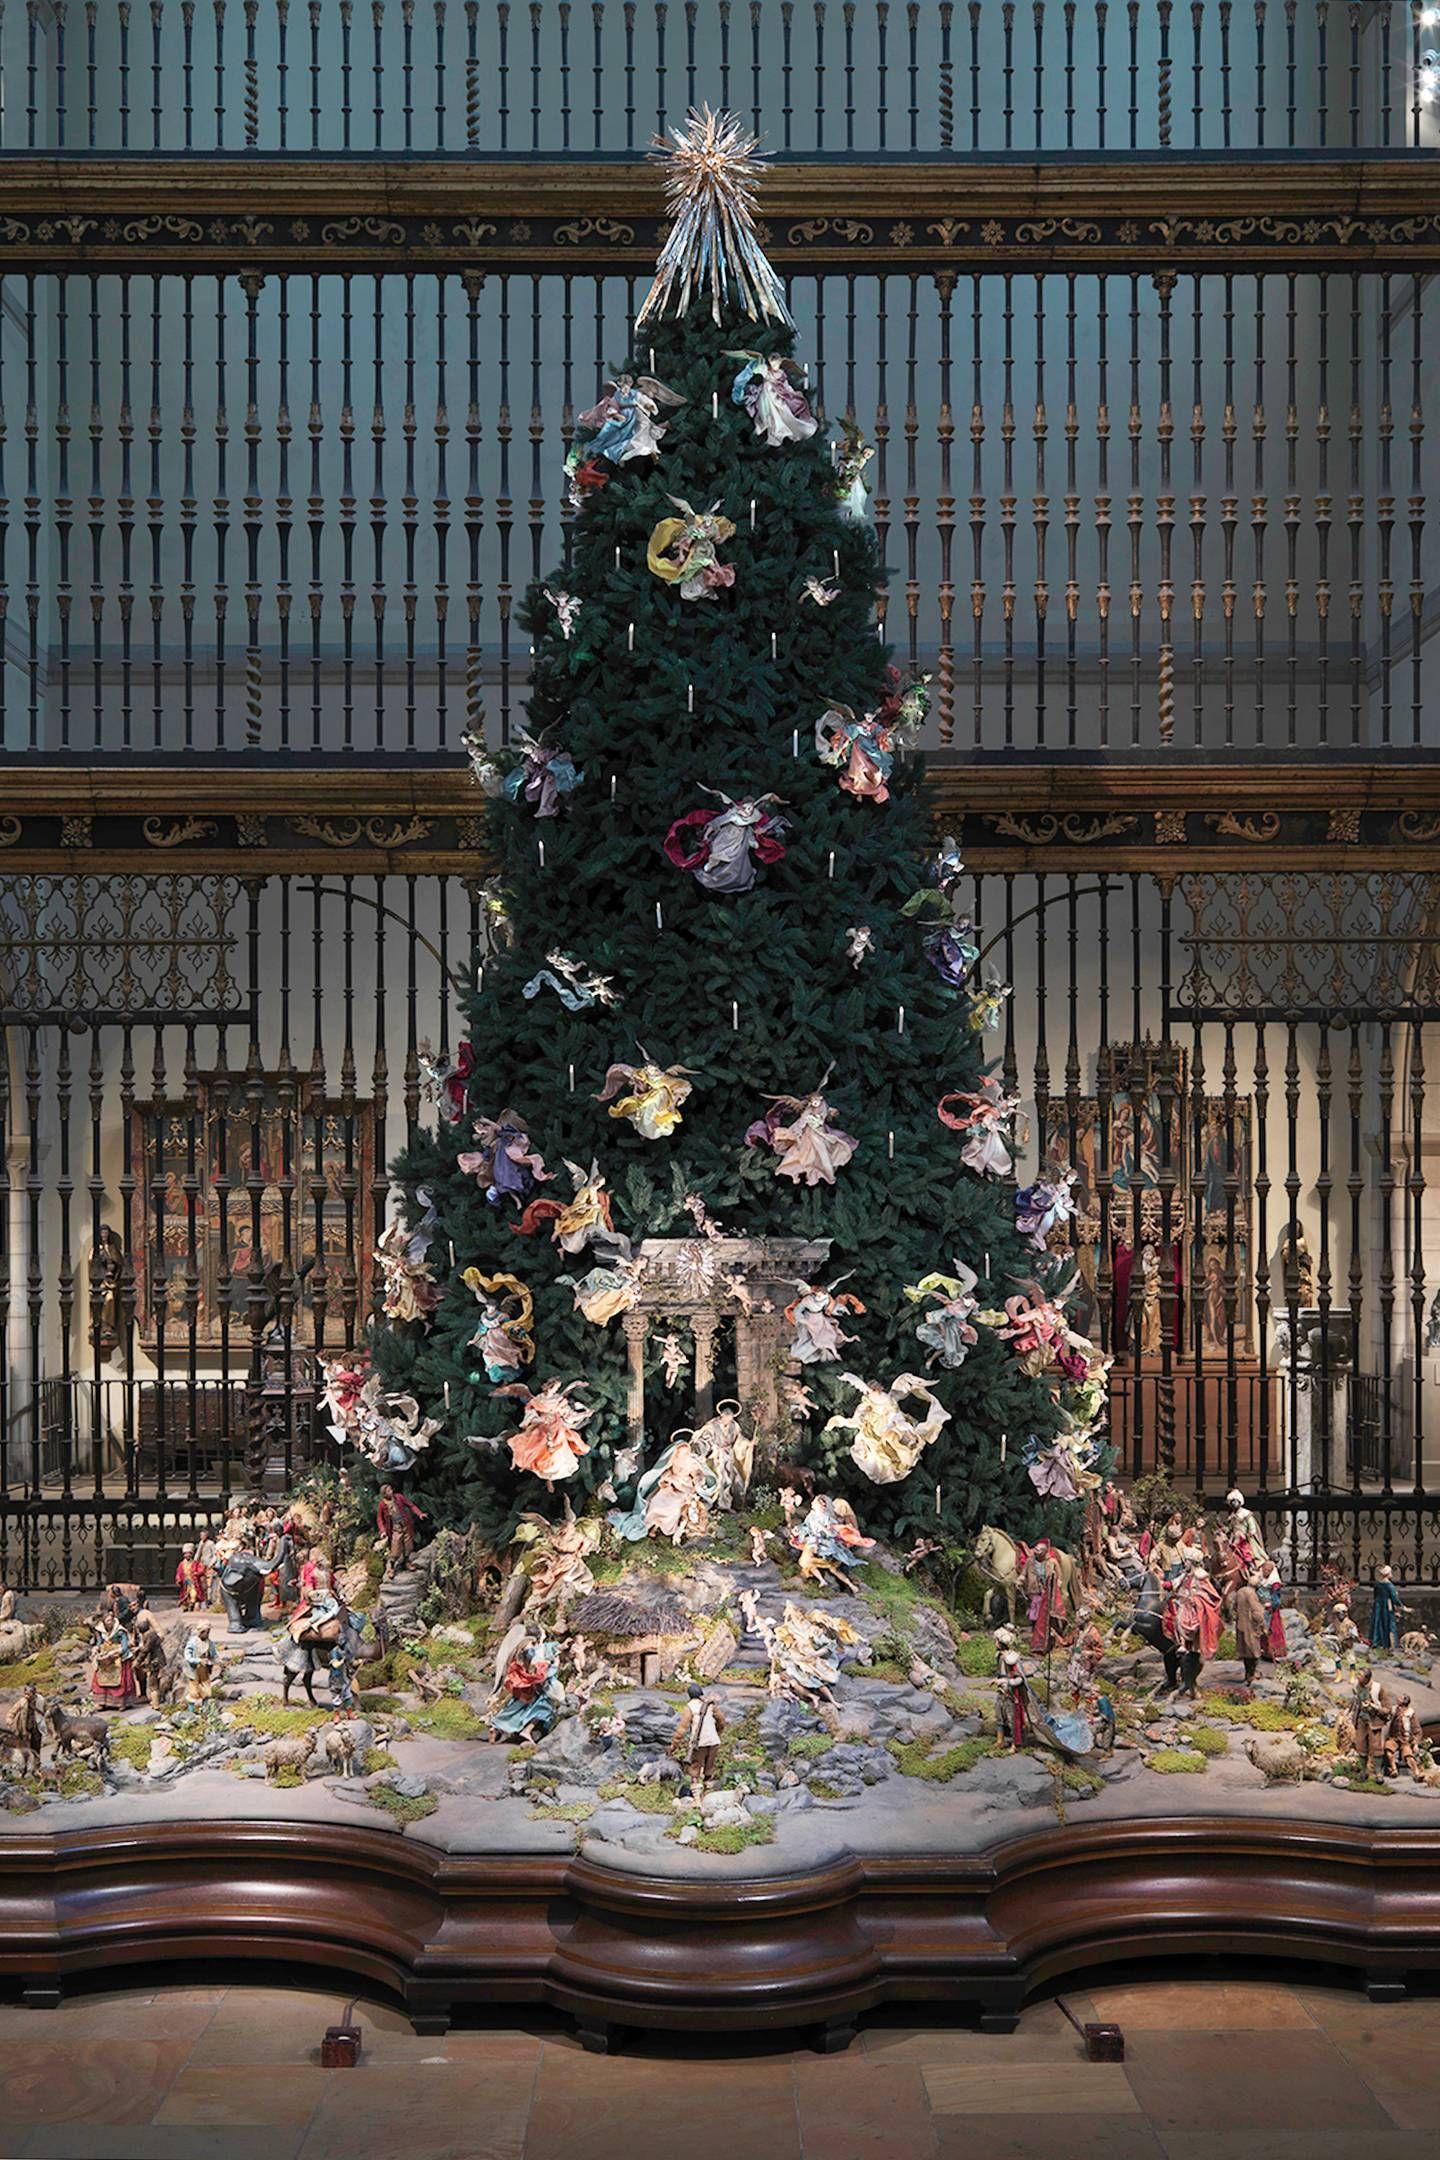 2 Metropolitan Museum Of Art Christmas Tree And Neapolitan Baroque Creche New York Christmas Christmas Christmas Tree